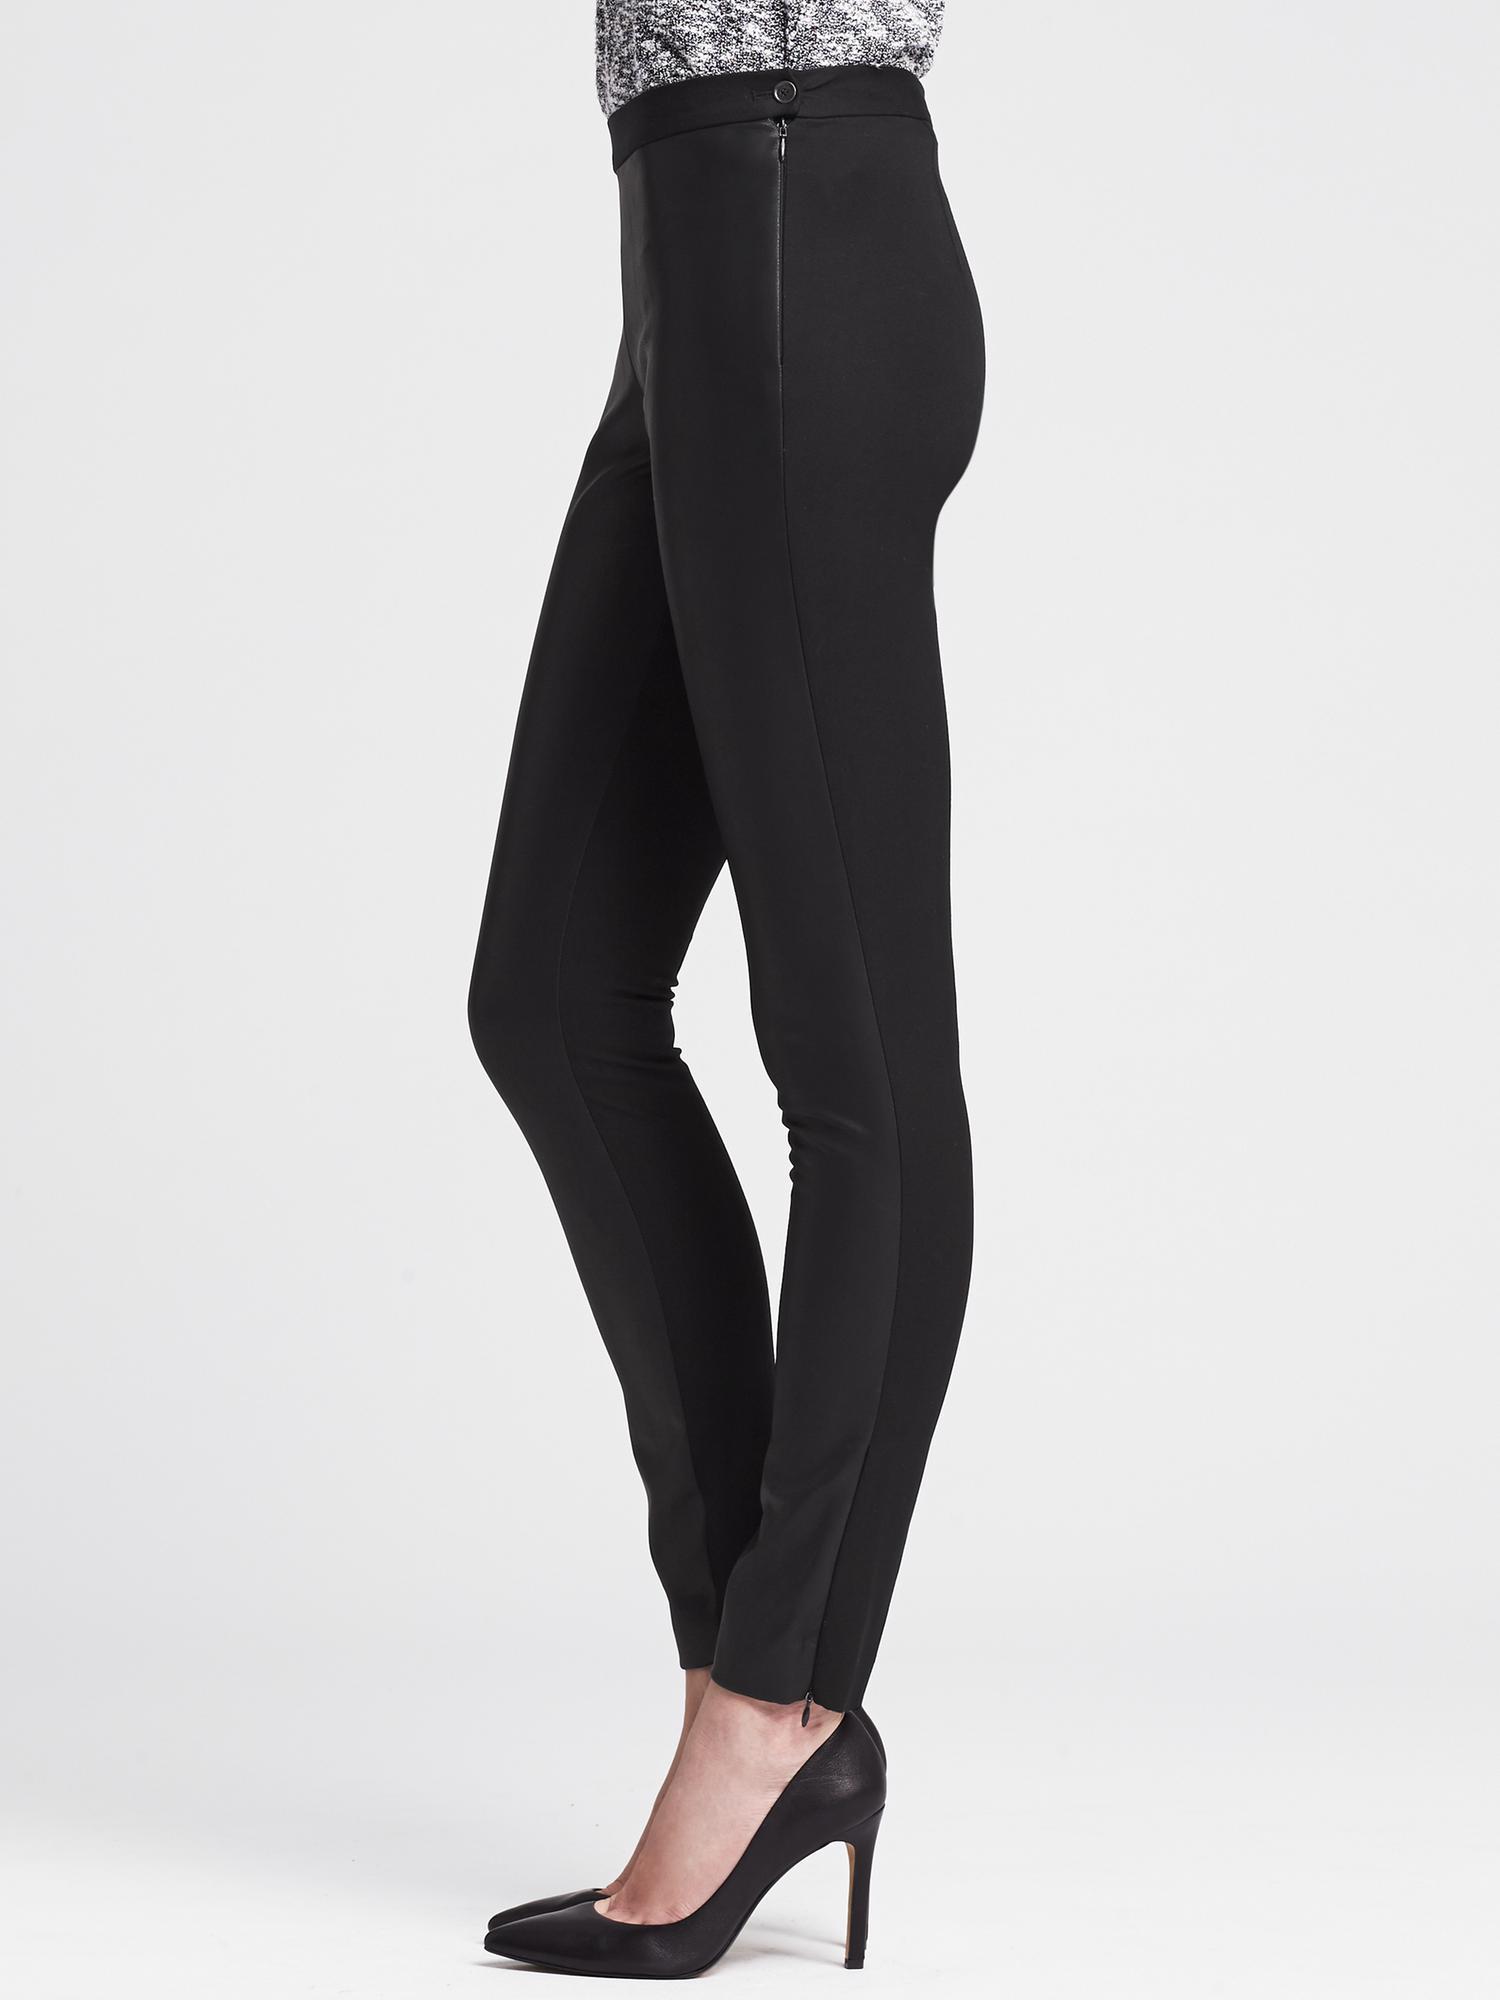 50f41fa48a8b84 Banana Republic Sloan-Fit Faux-Leather Front Legging in Black - Lyst